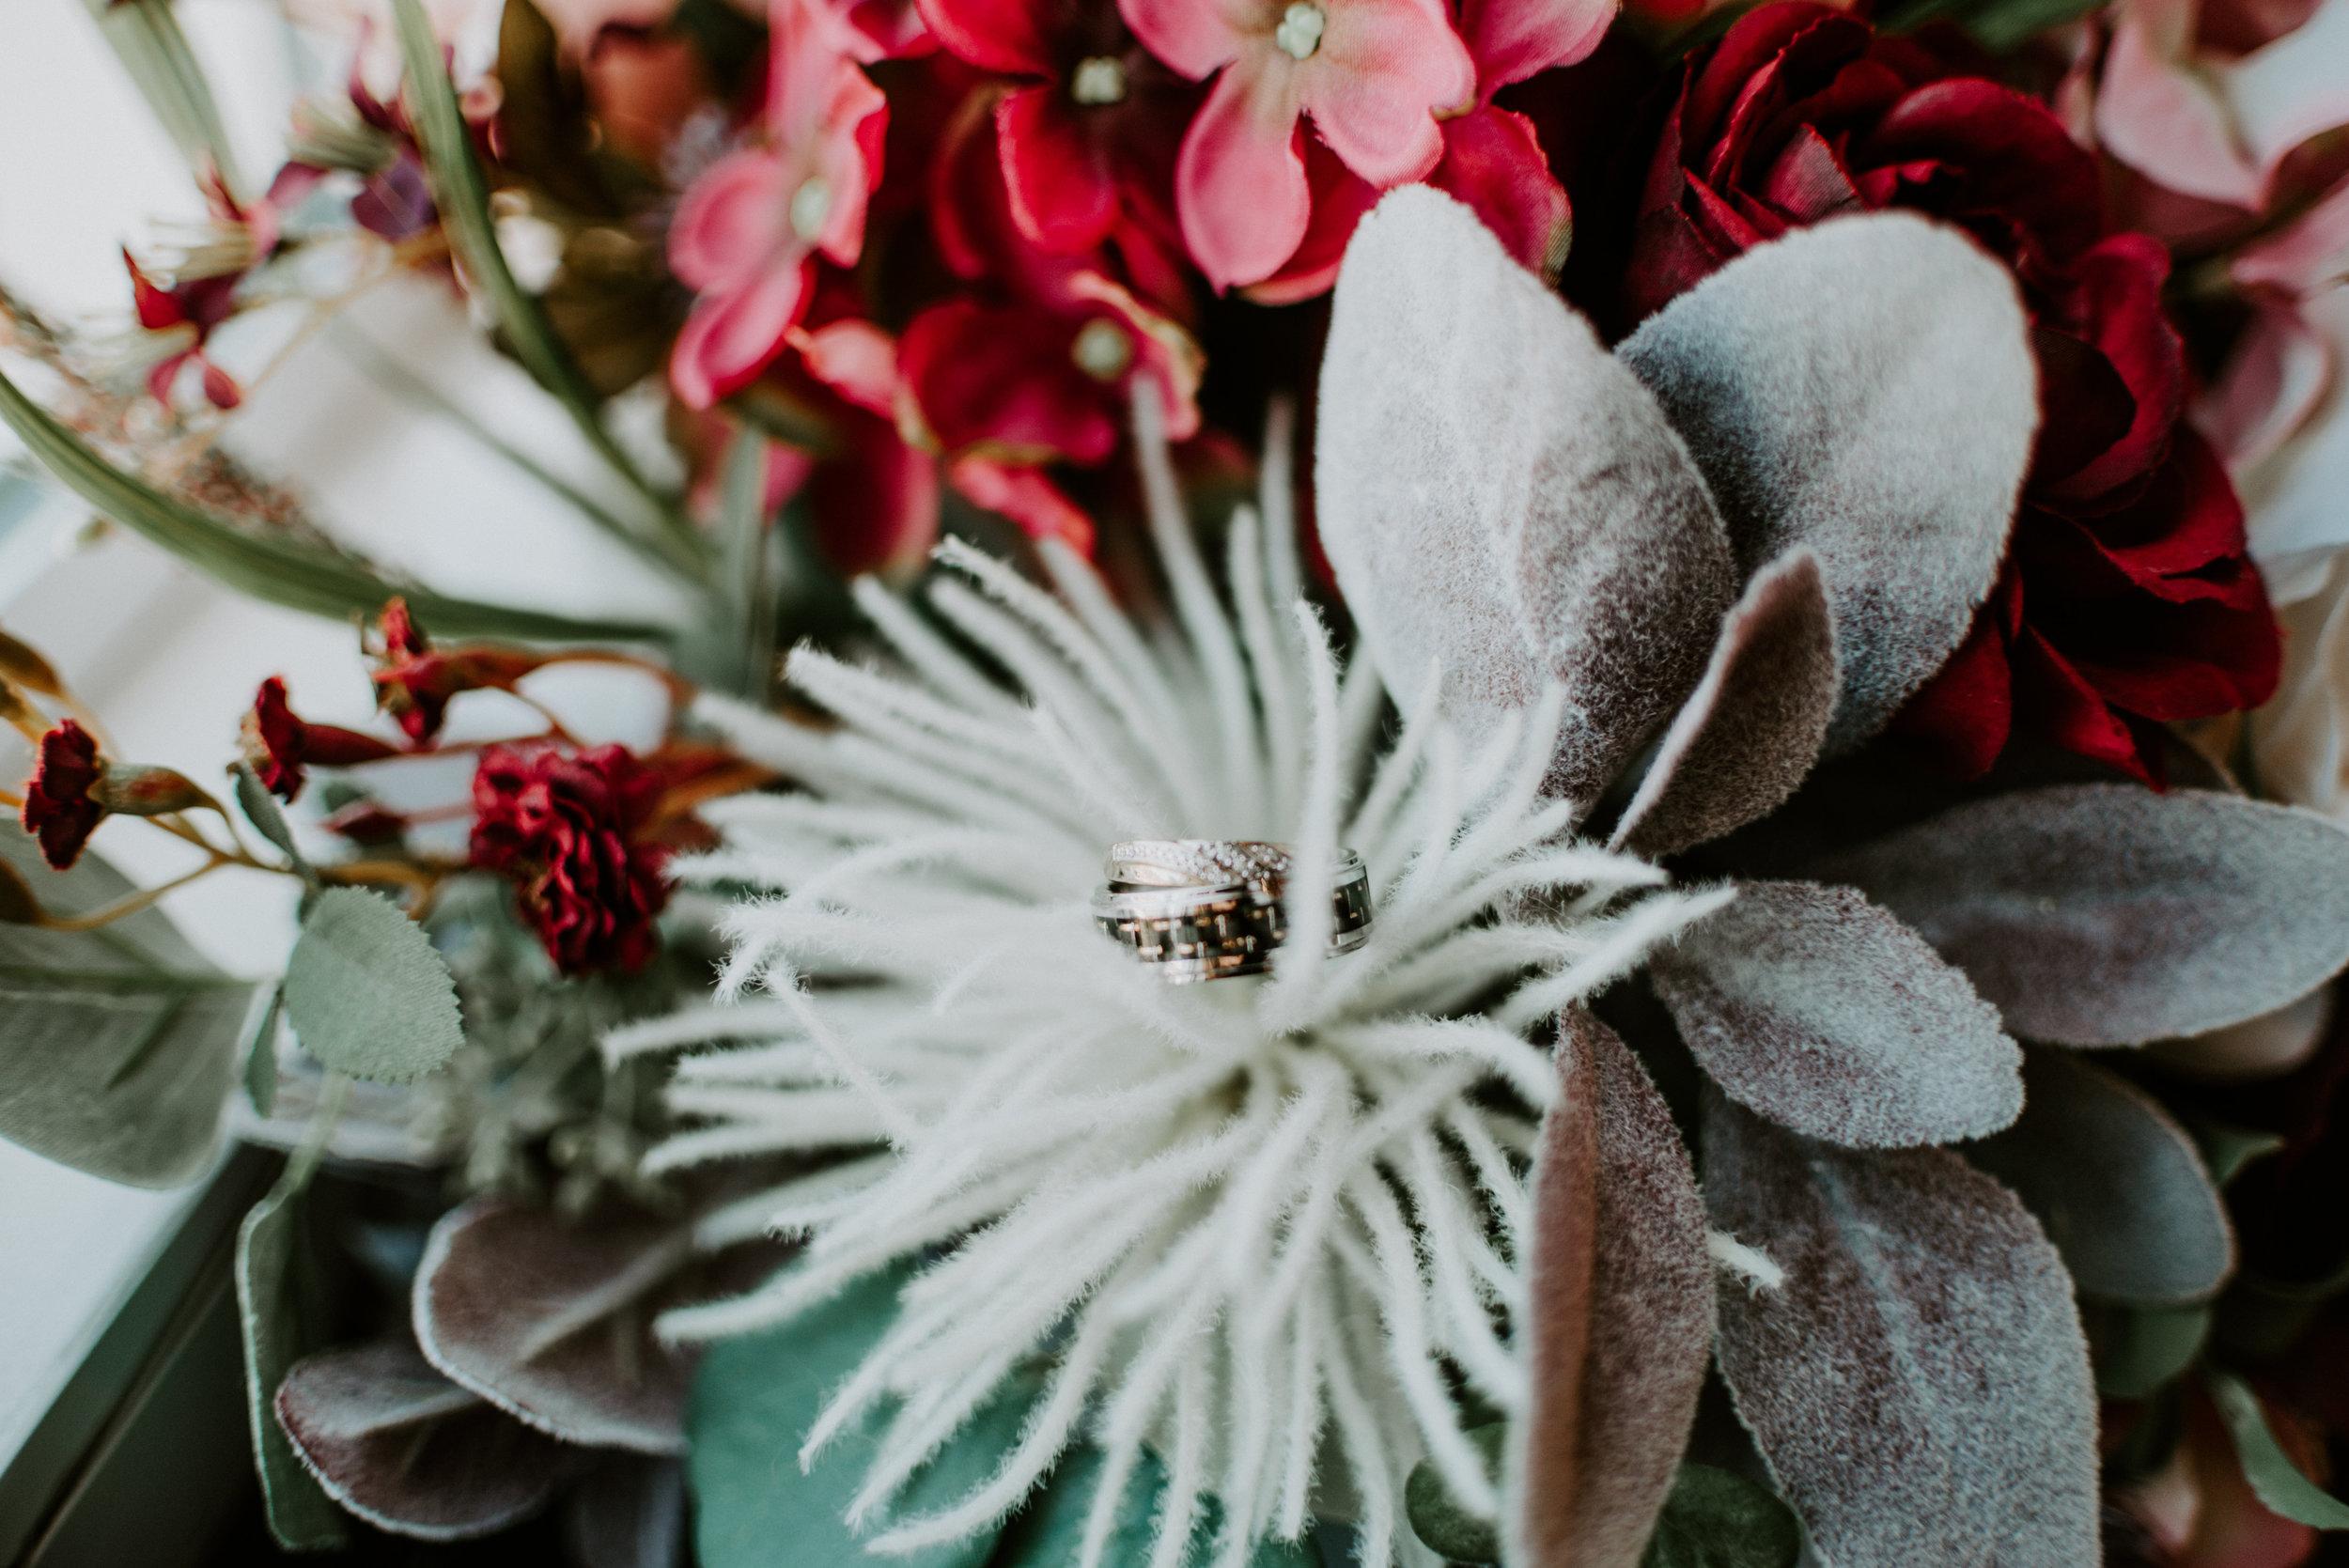 WonderlyCreative_Wedding_6.7.18_Khara&Dwayne_-41.jpg